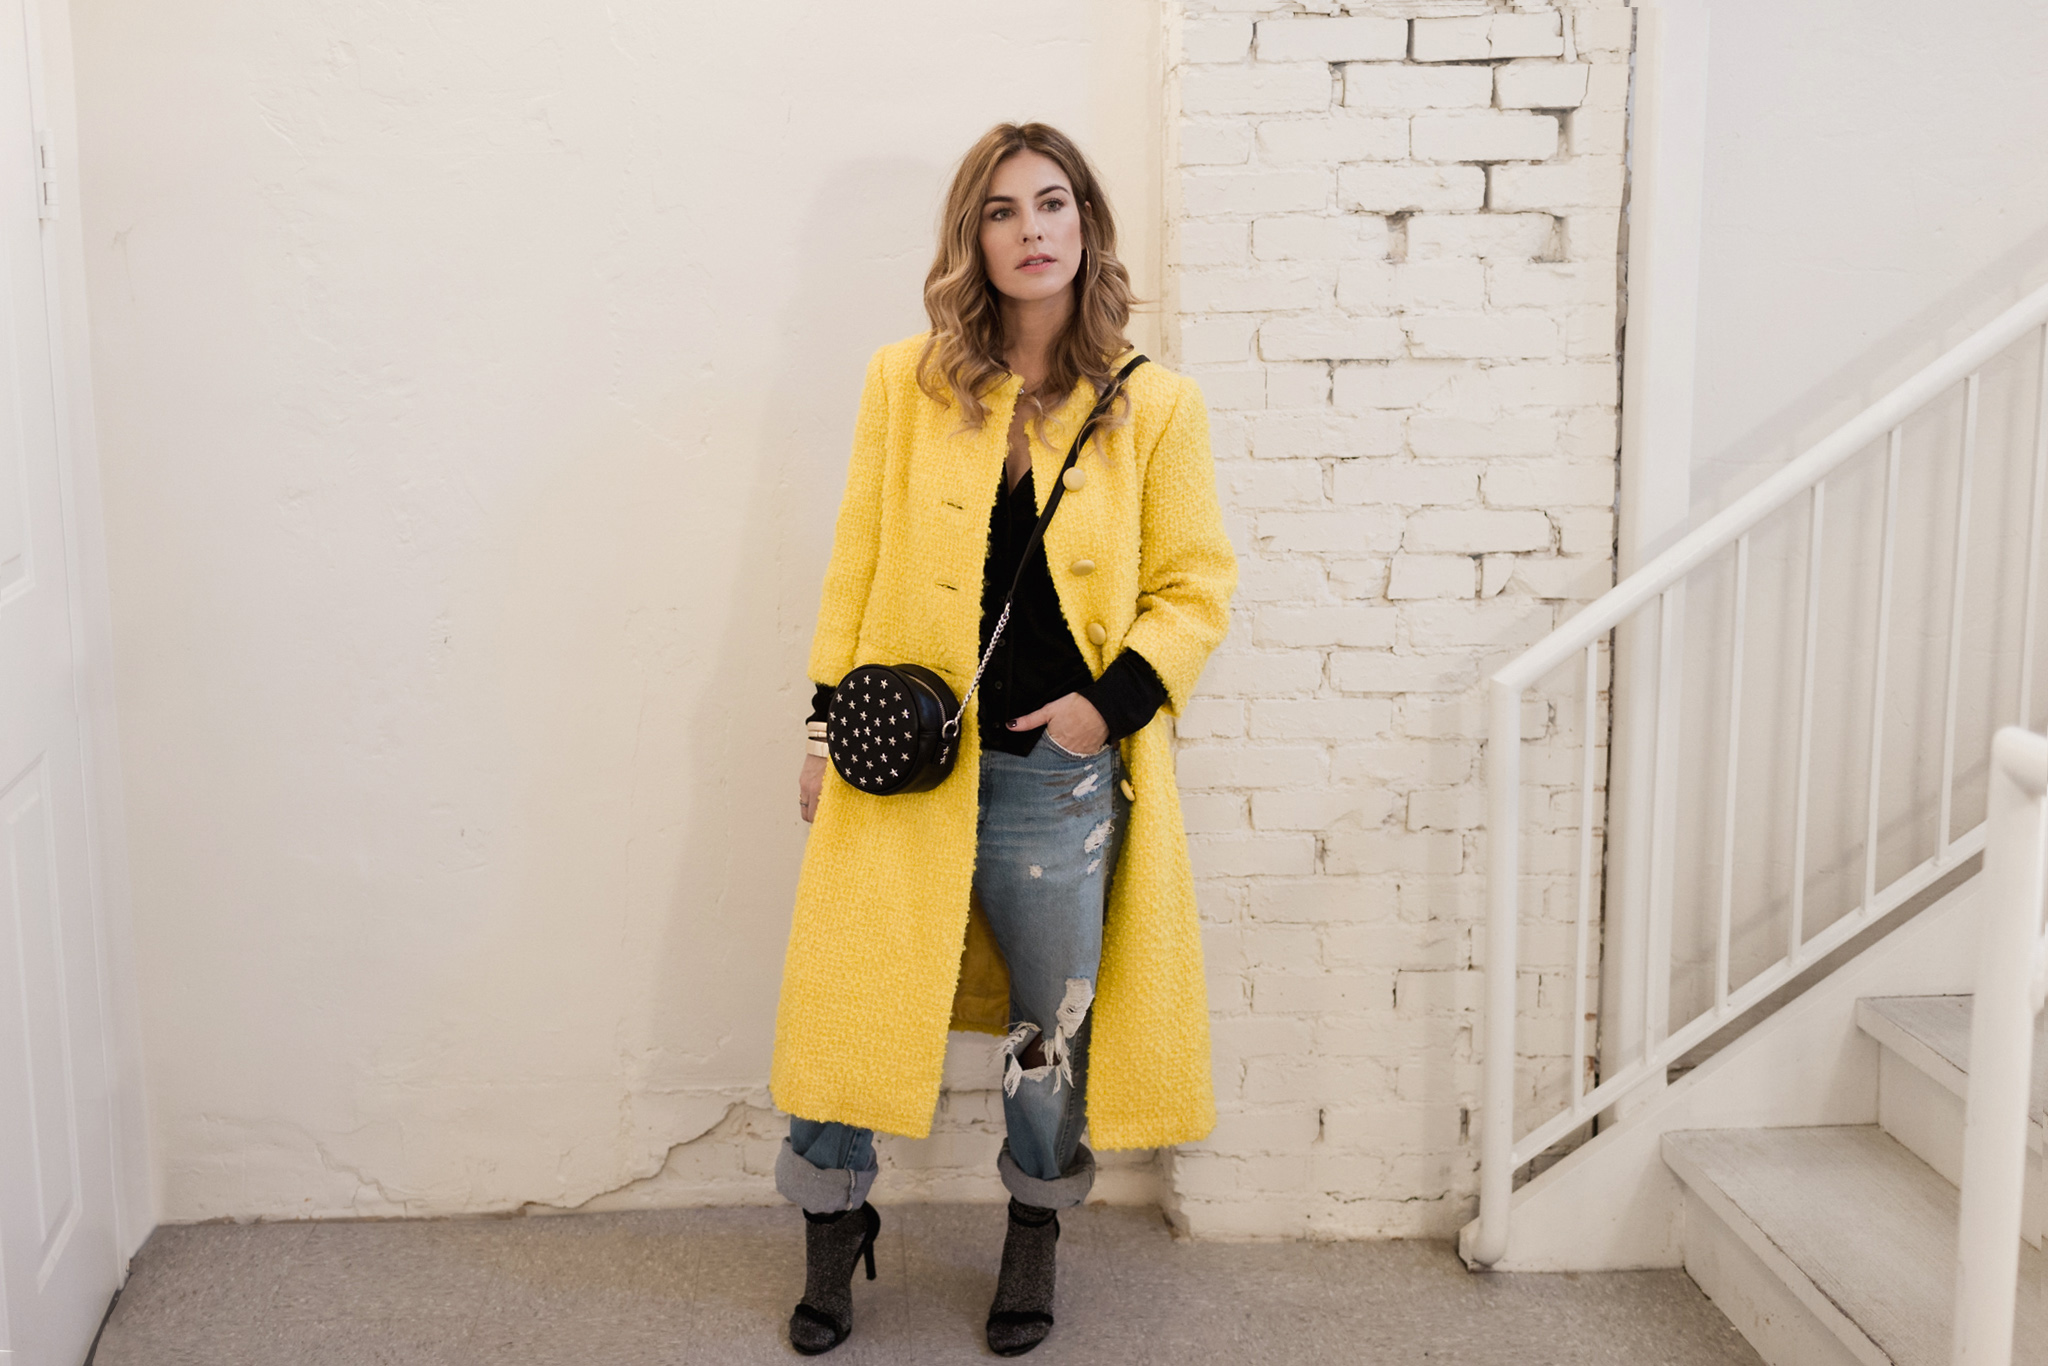 Eldridge Edit_Anna_E_Cottrell_Fashion_Blogger_Yellow_Vintage_Coat_Wrangler_Boyfriend_Jeans_Spring_Trend_2017_Star_Crossbody_Bag_Socks_with_Heels_Trend_MGB_Photo_1.jpg